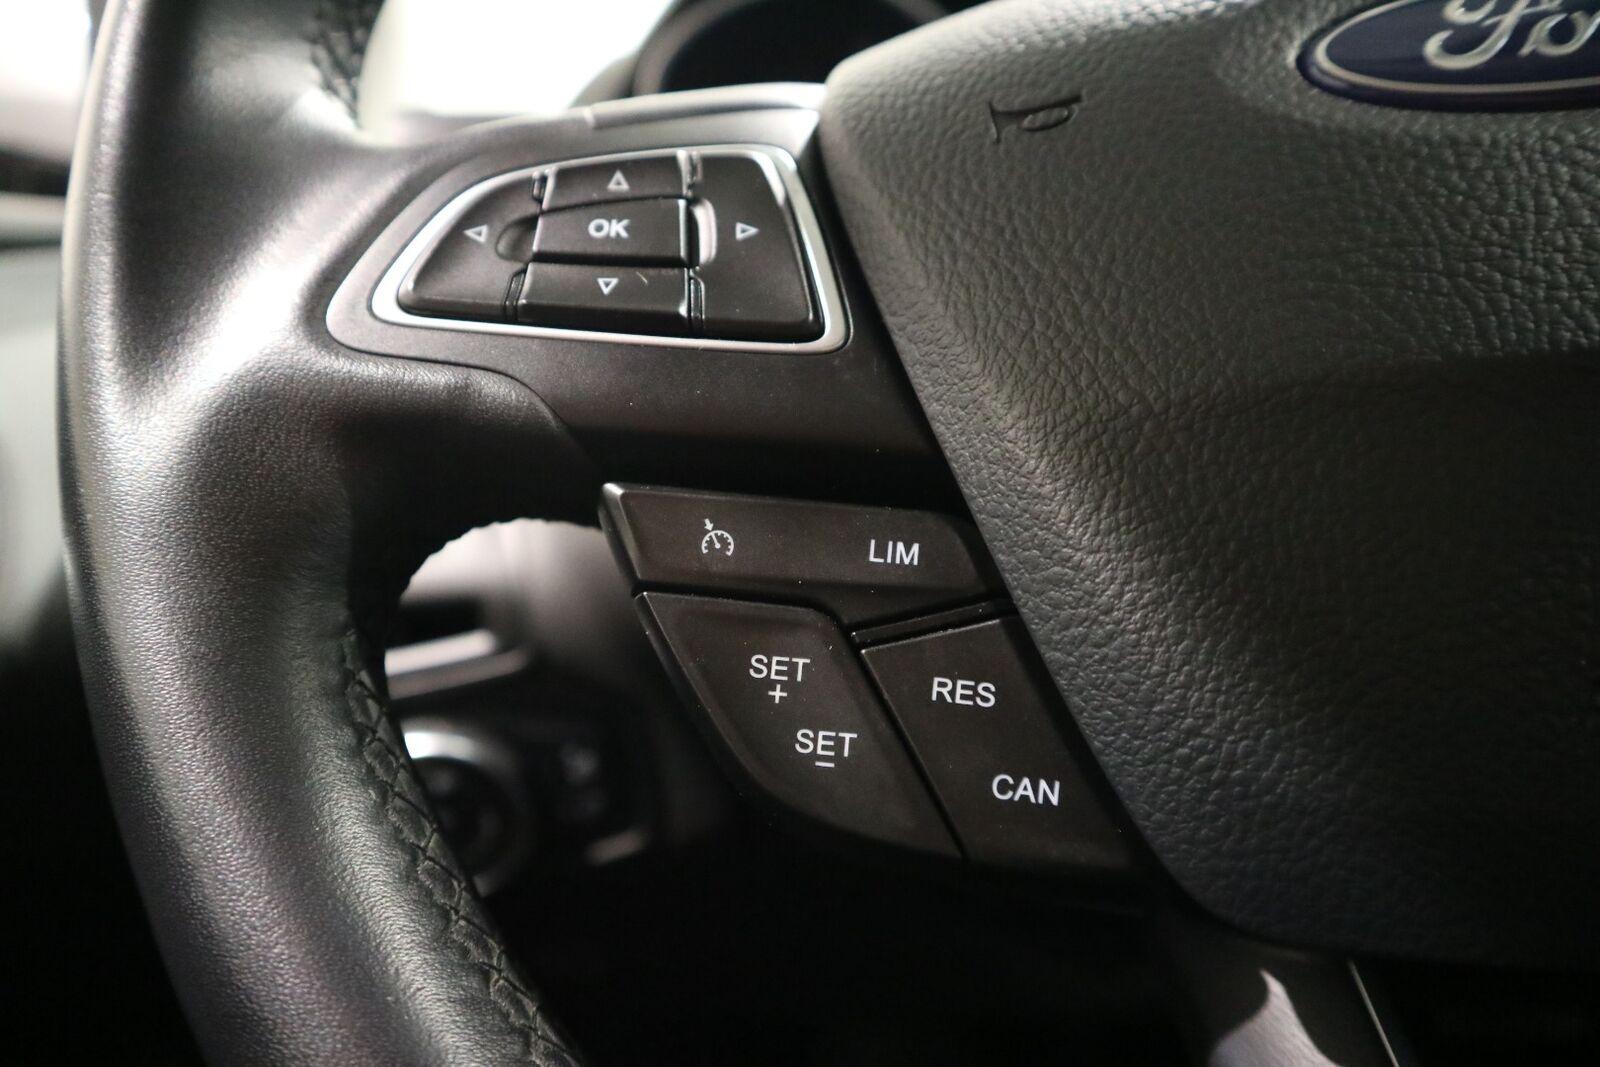 Ford Focus 1,5 TDCi 120 Business stc. - billede 4